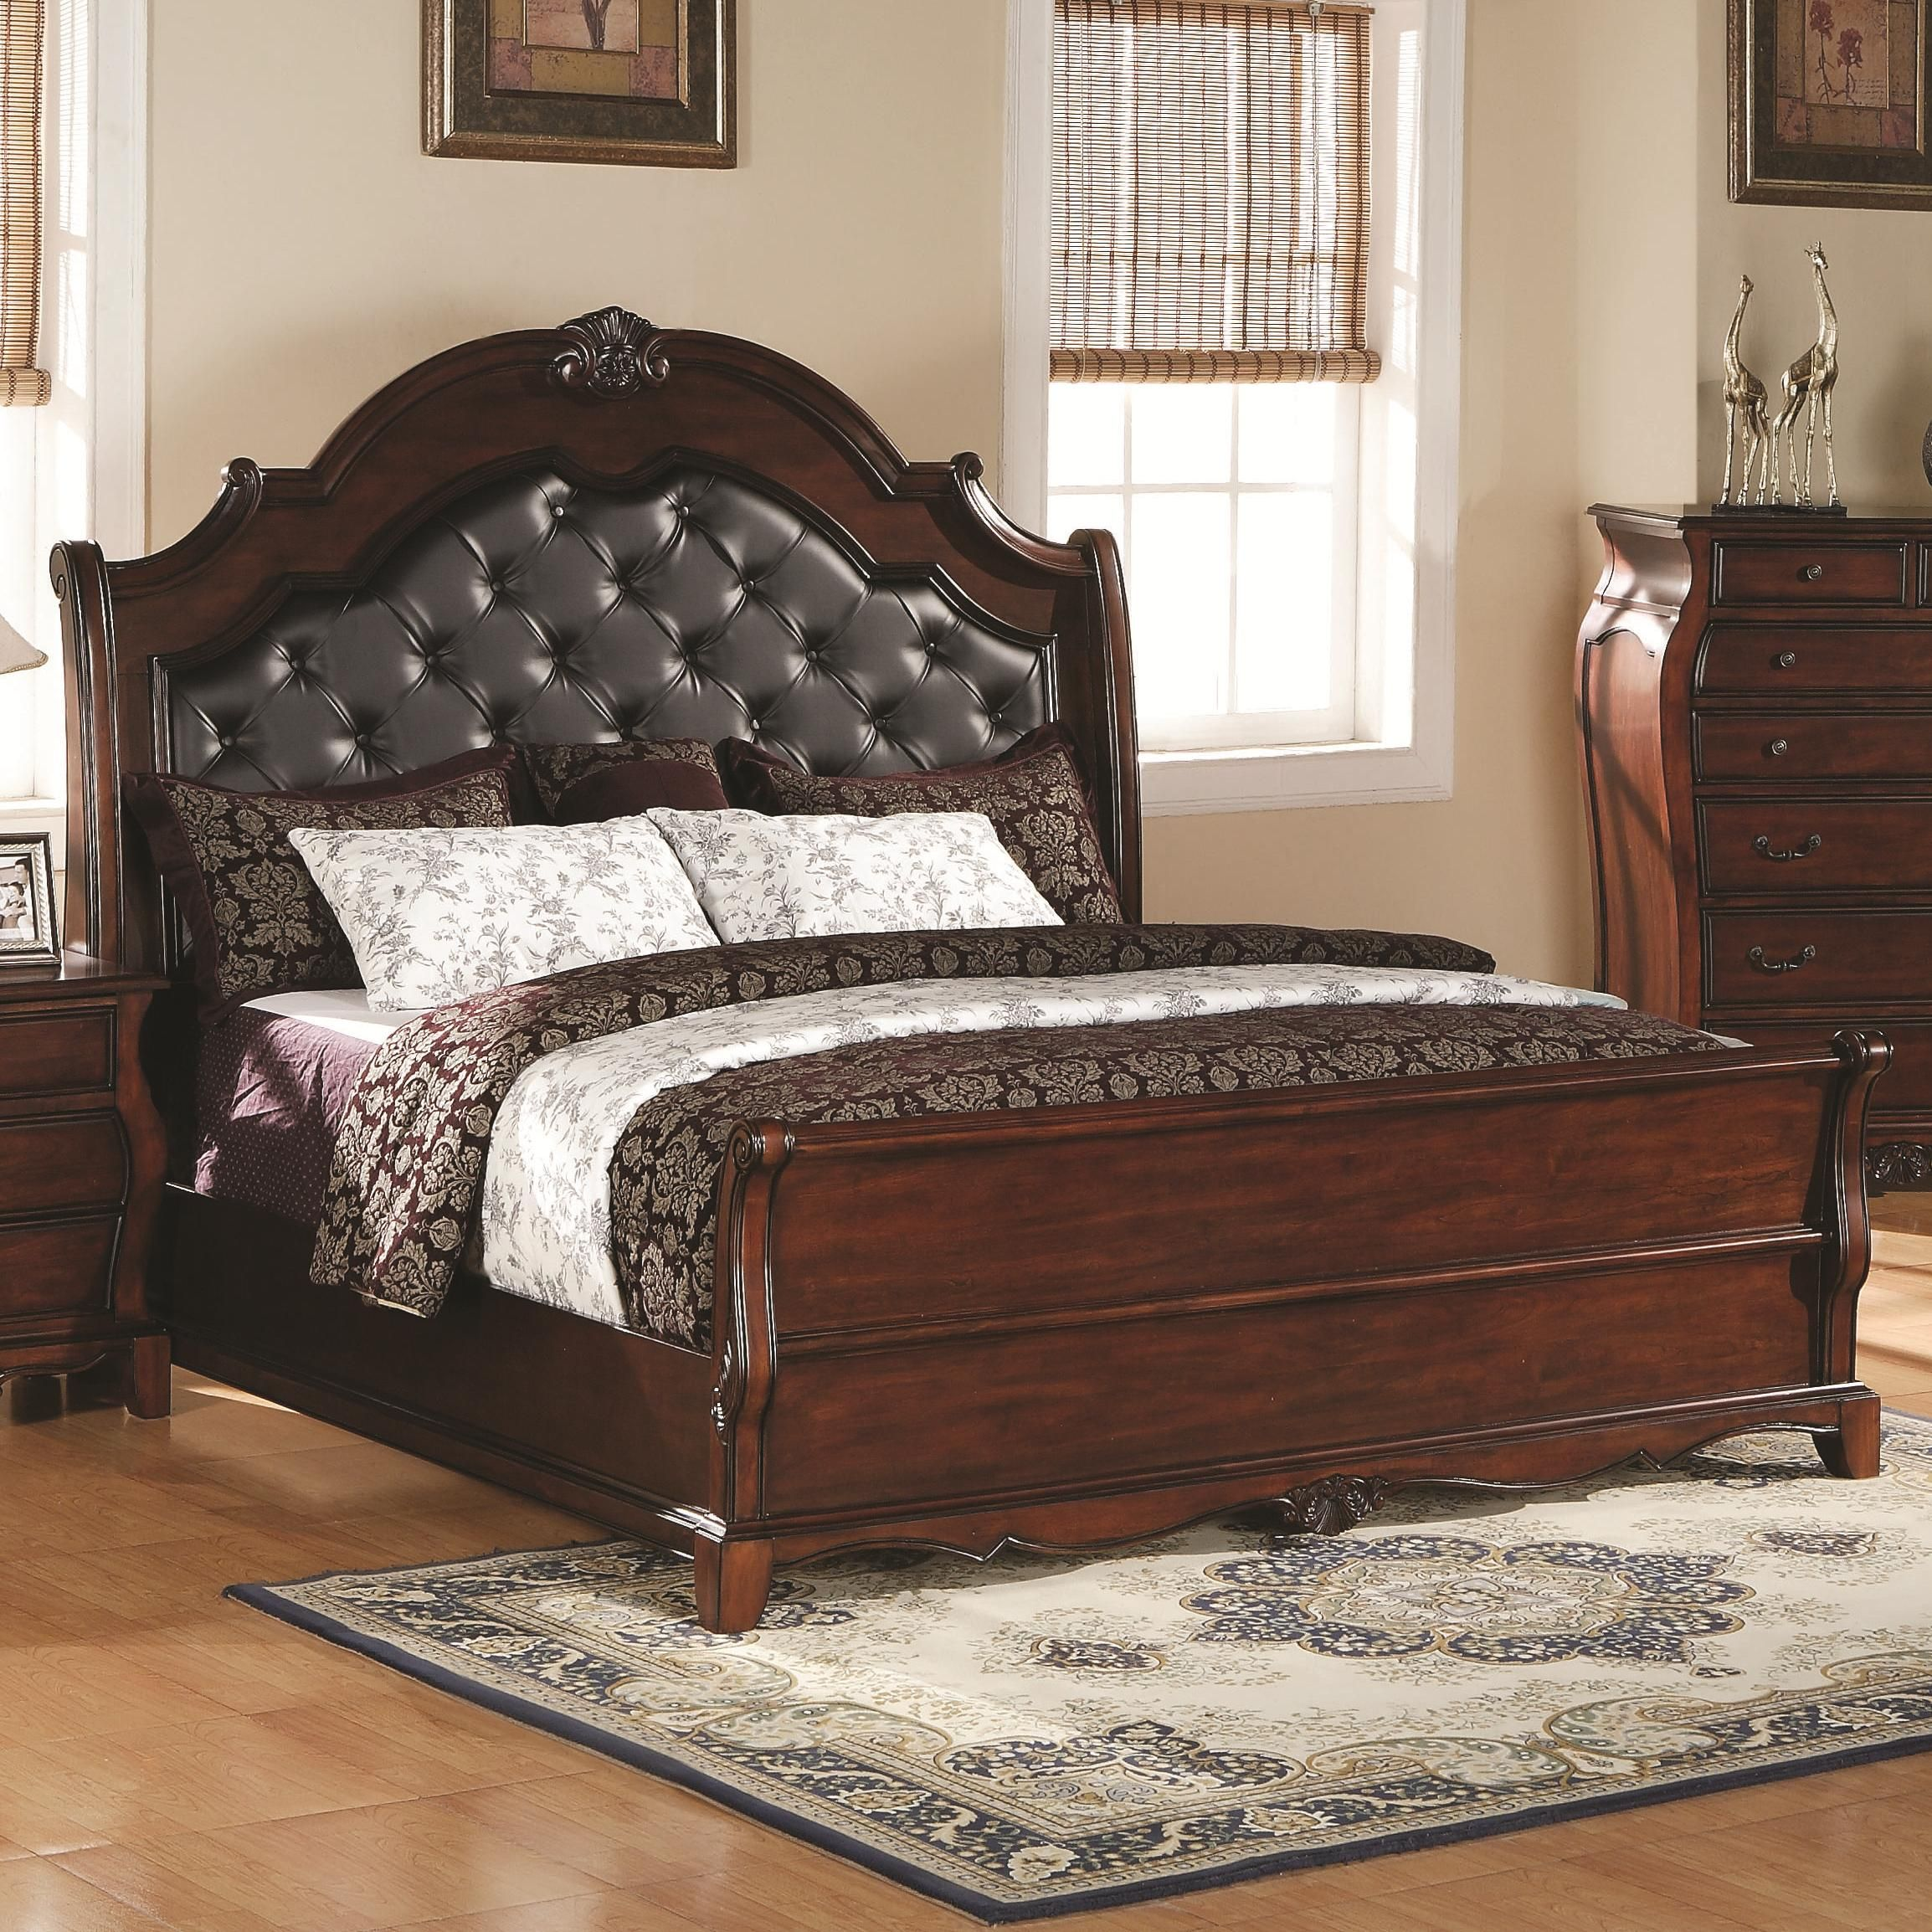 bed products platform elements international raven headboard item number kcr b faux king leather